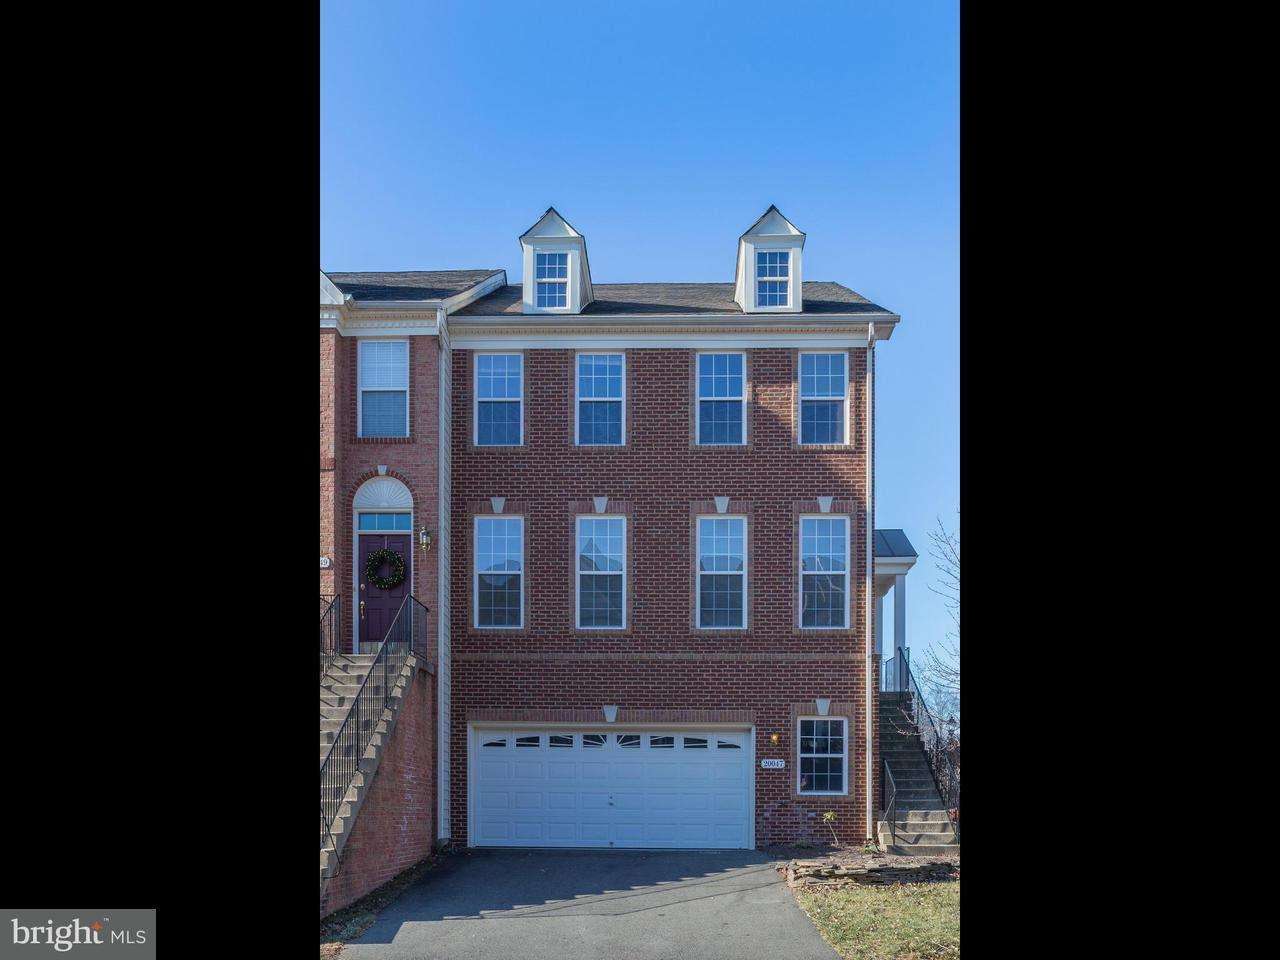 Townhouse for Sale at 20047 Northville Hills Ter 20047 Northville Hills Ter Ashburn, Virginia 20147 United States